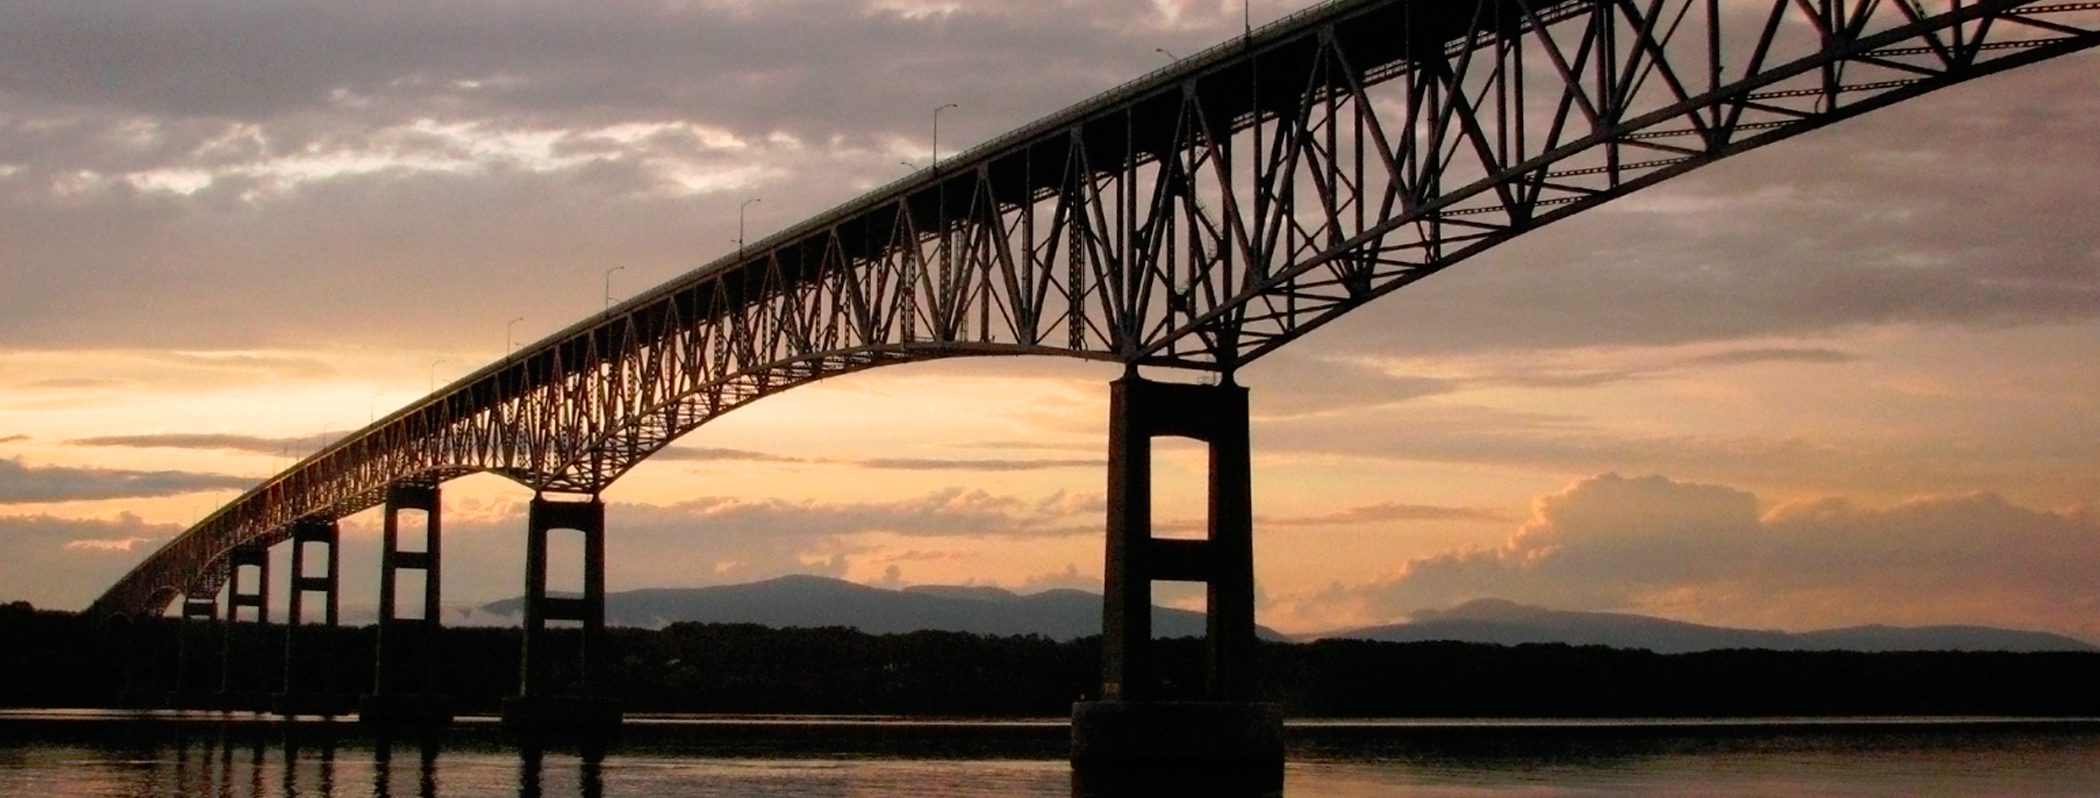 Hudson Valley Bridge